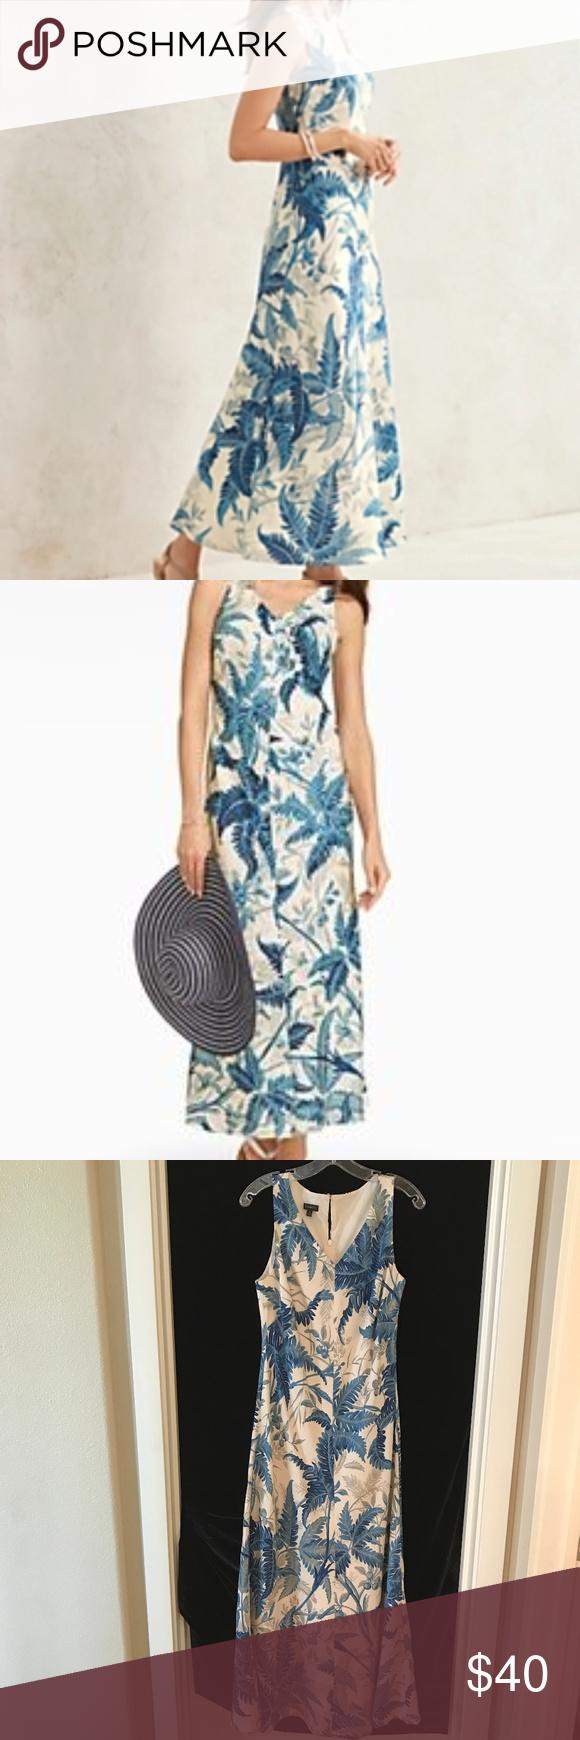 Talbots Tropical Fern Toile Maxi Dress Blue 8 Maxi Dress Blue Maxi Dress Dresses [ 1740 x 580 Pixel ]